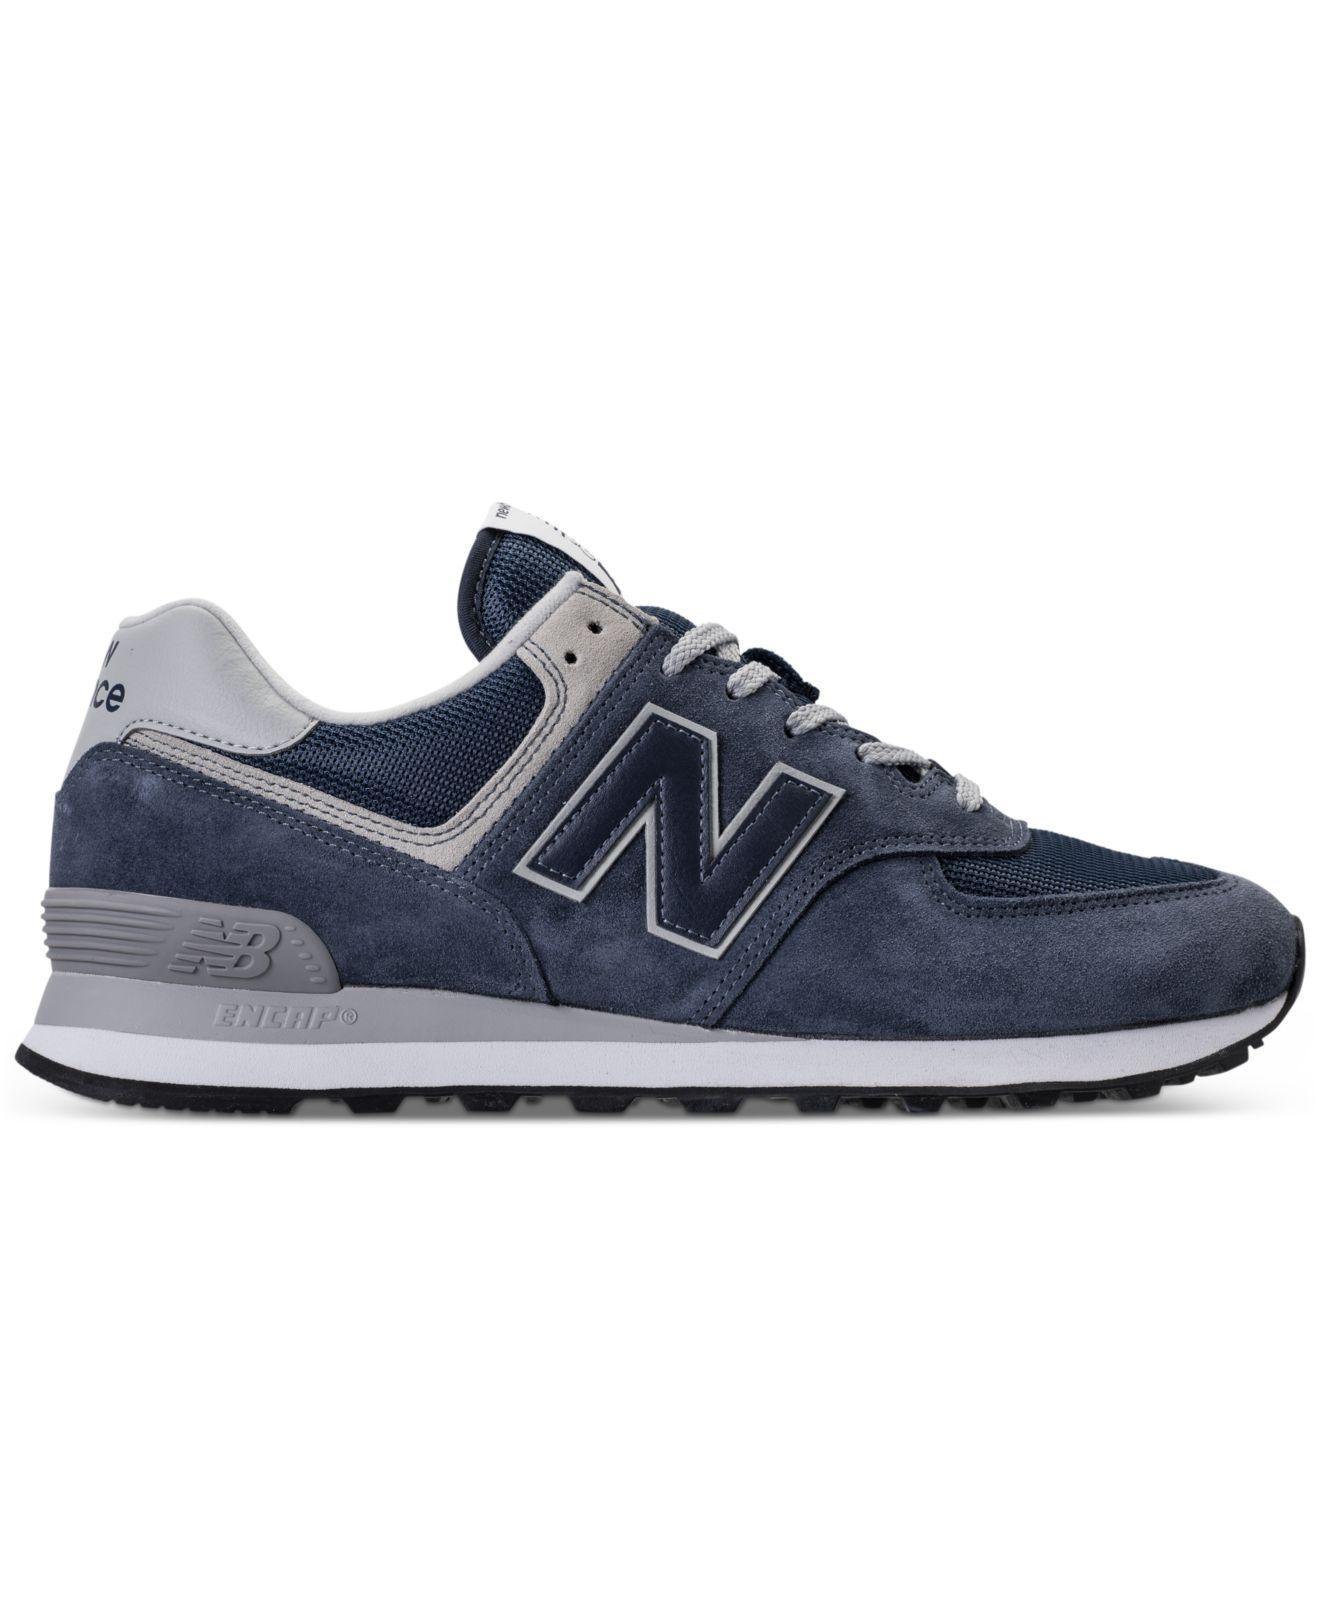 new balance 574 classic blu